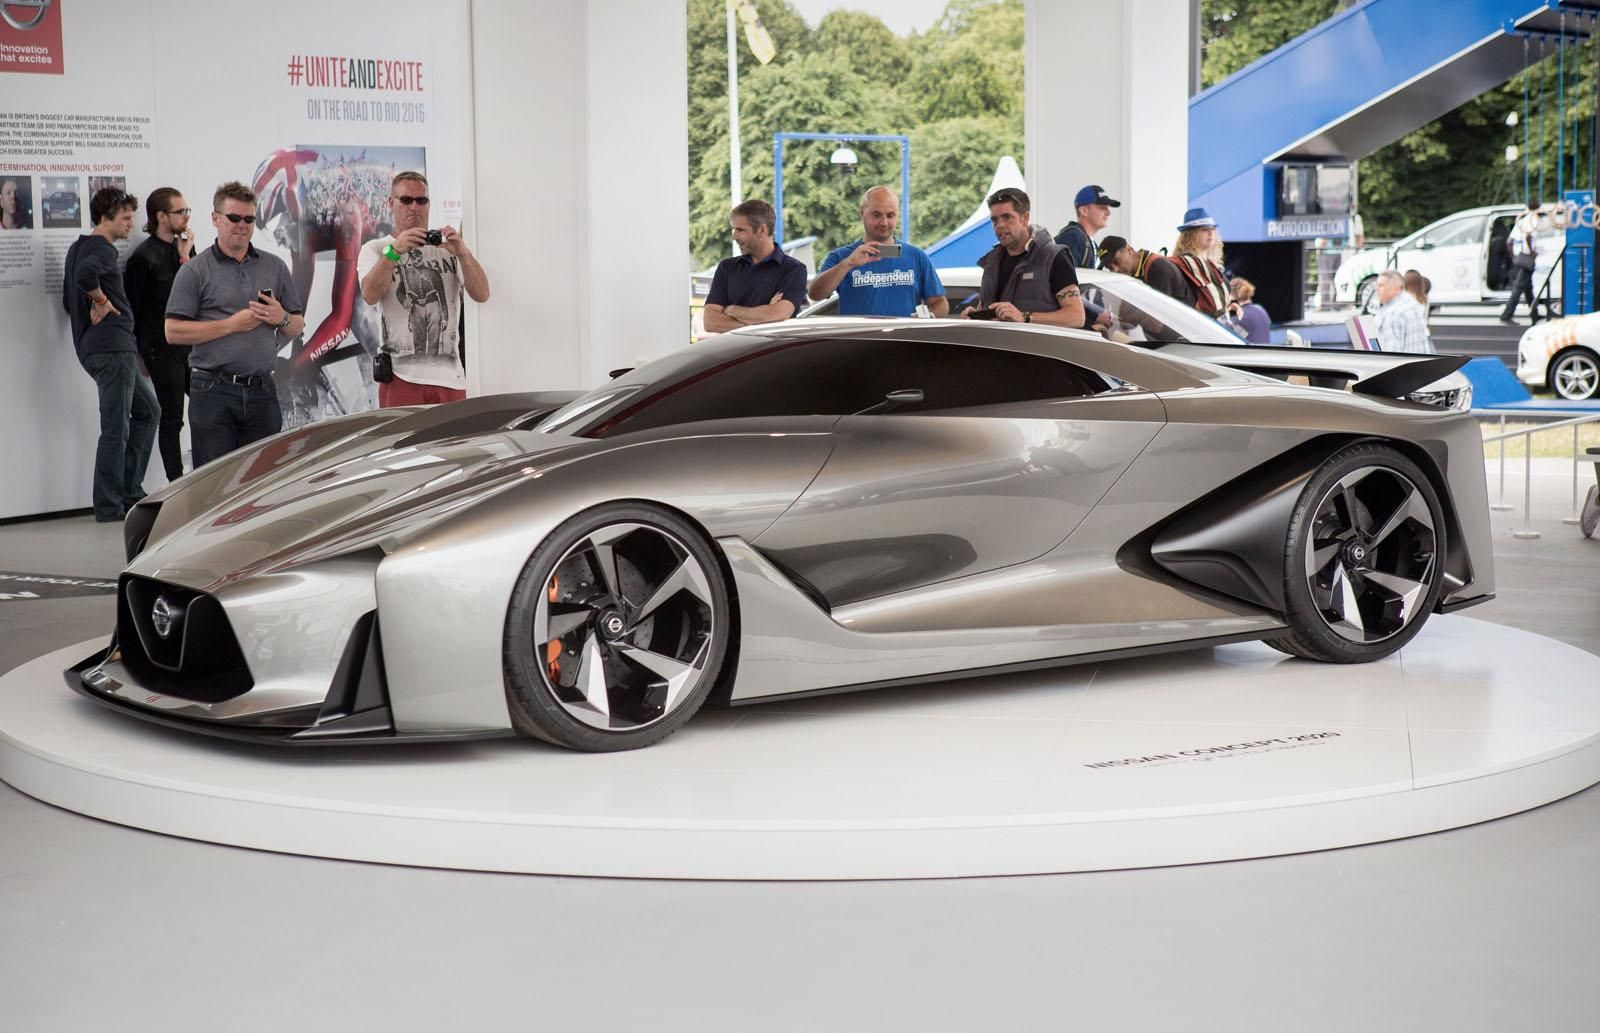 The Nissan Concept 2020 Vision Gran Turismo Was Presented At Goodwood Nissan Gtr Nissan Gt R Nissan Gt